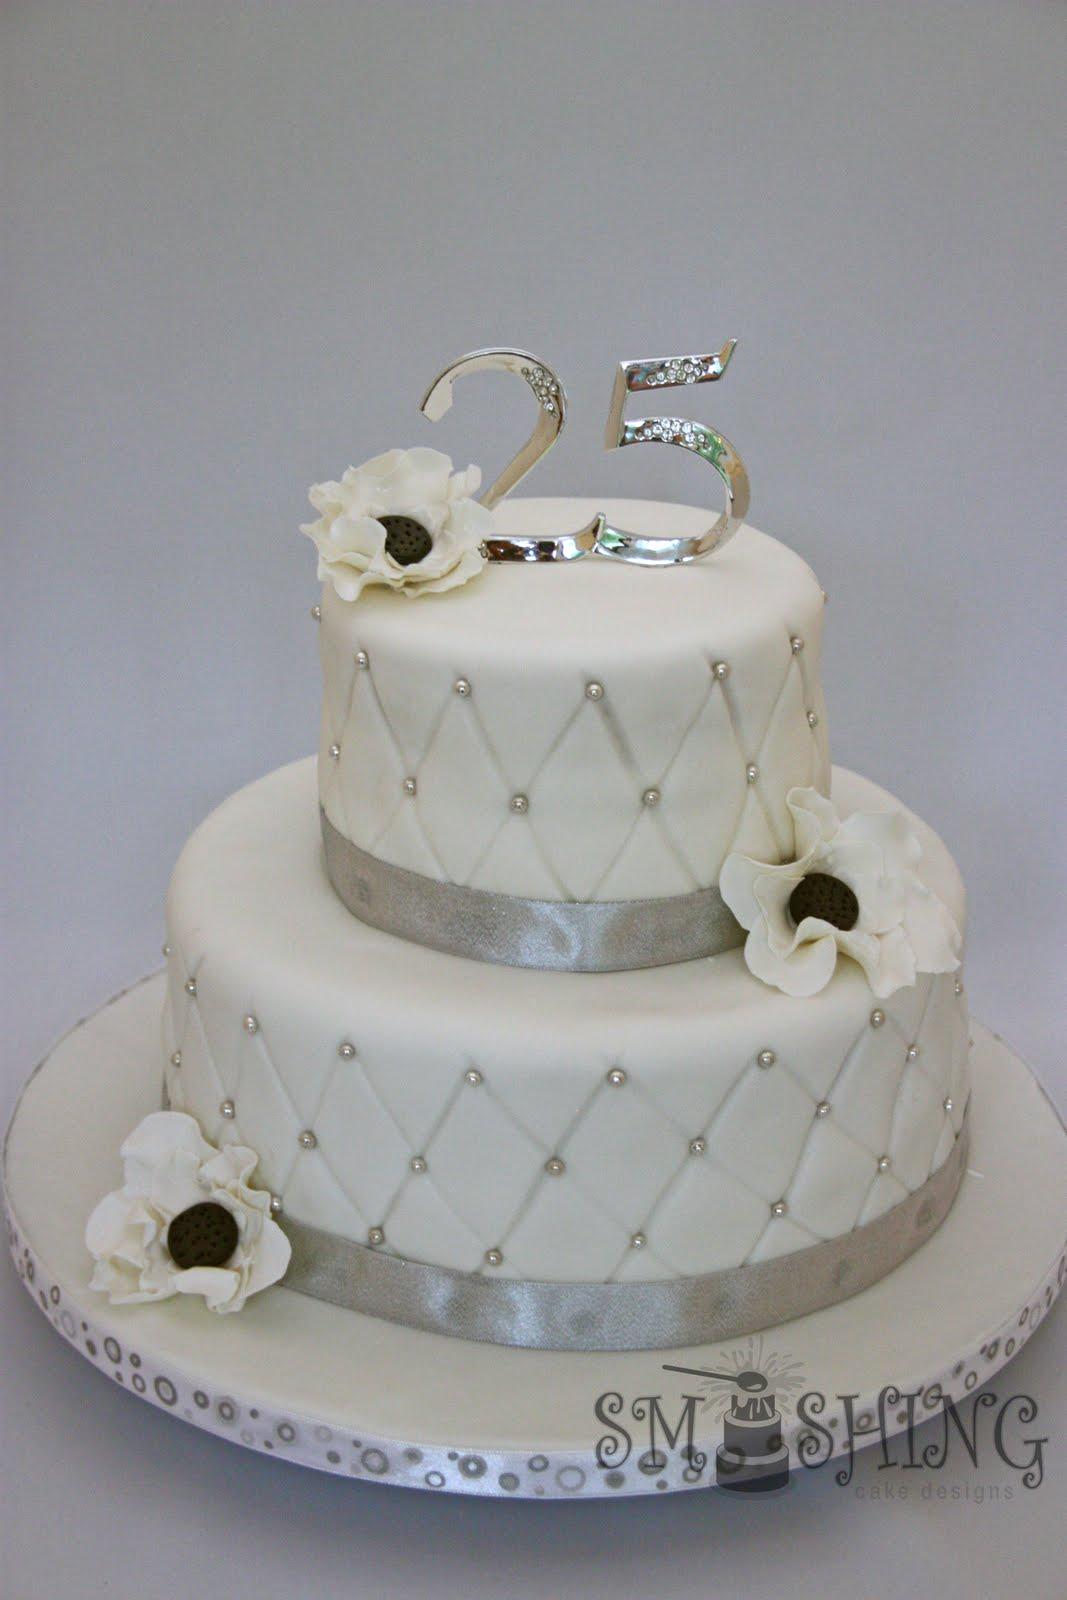 Smashing Cake Designs Silver Anniversary